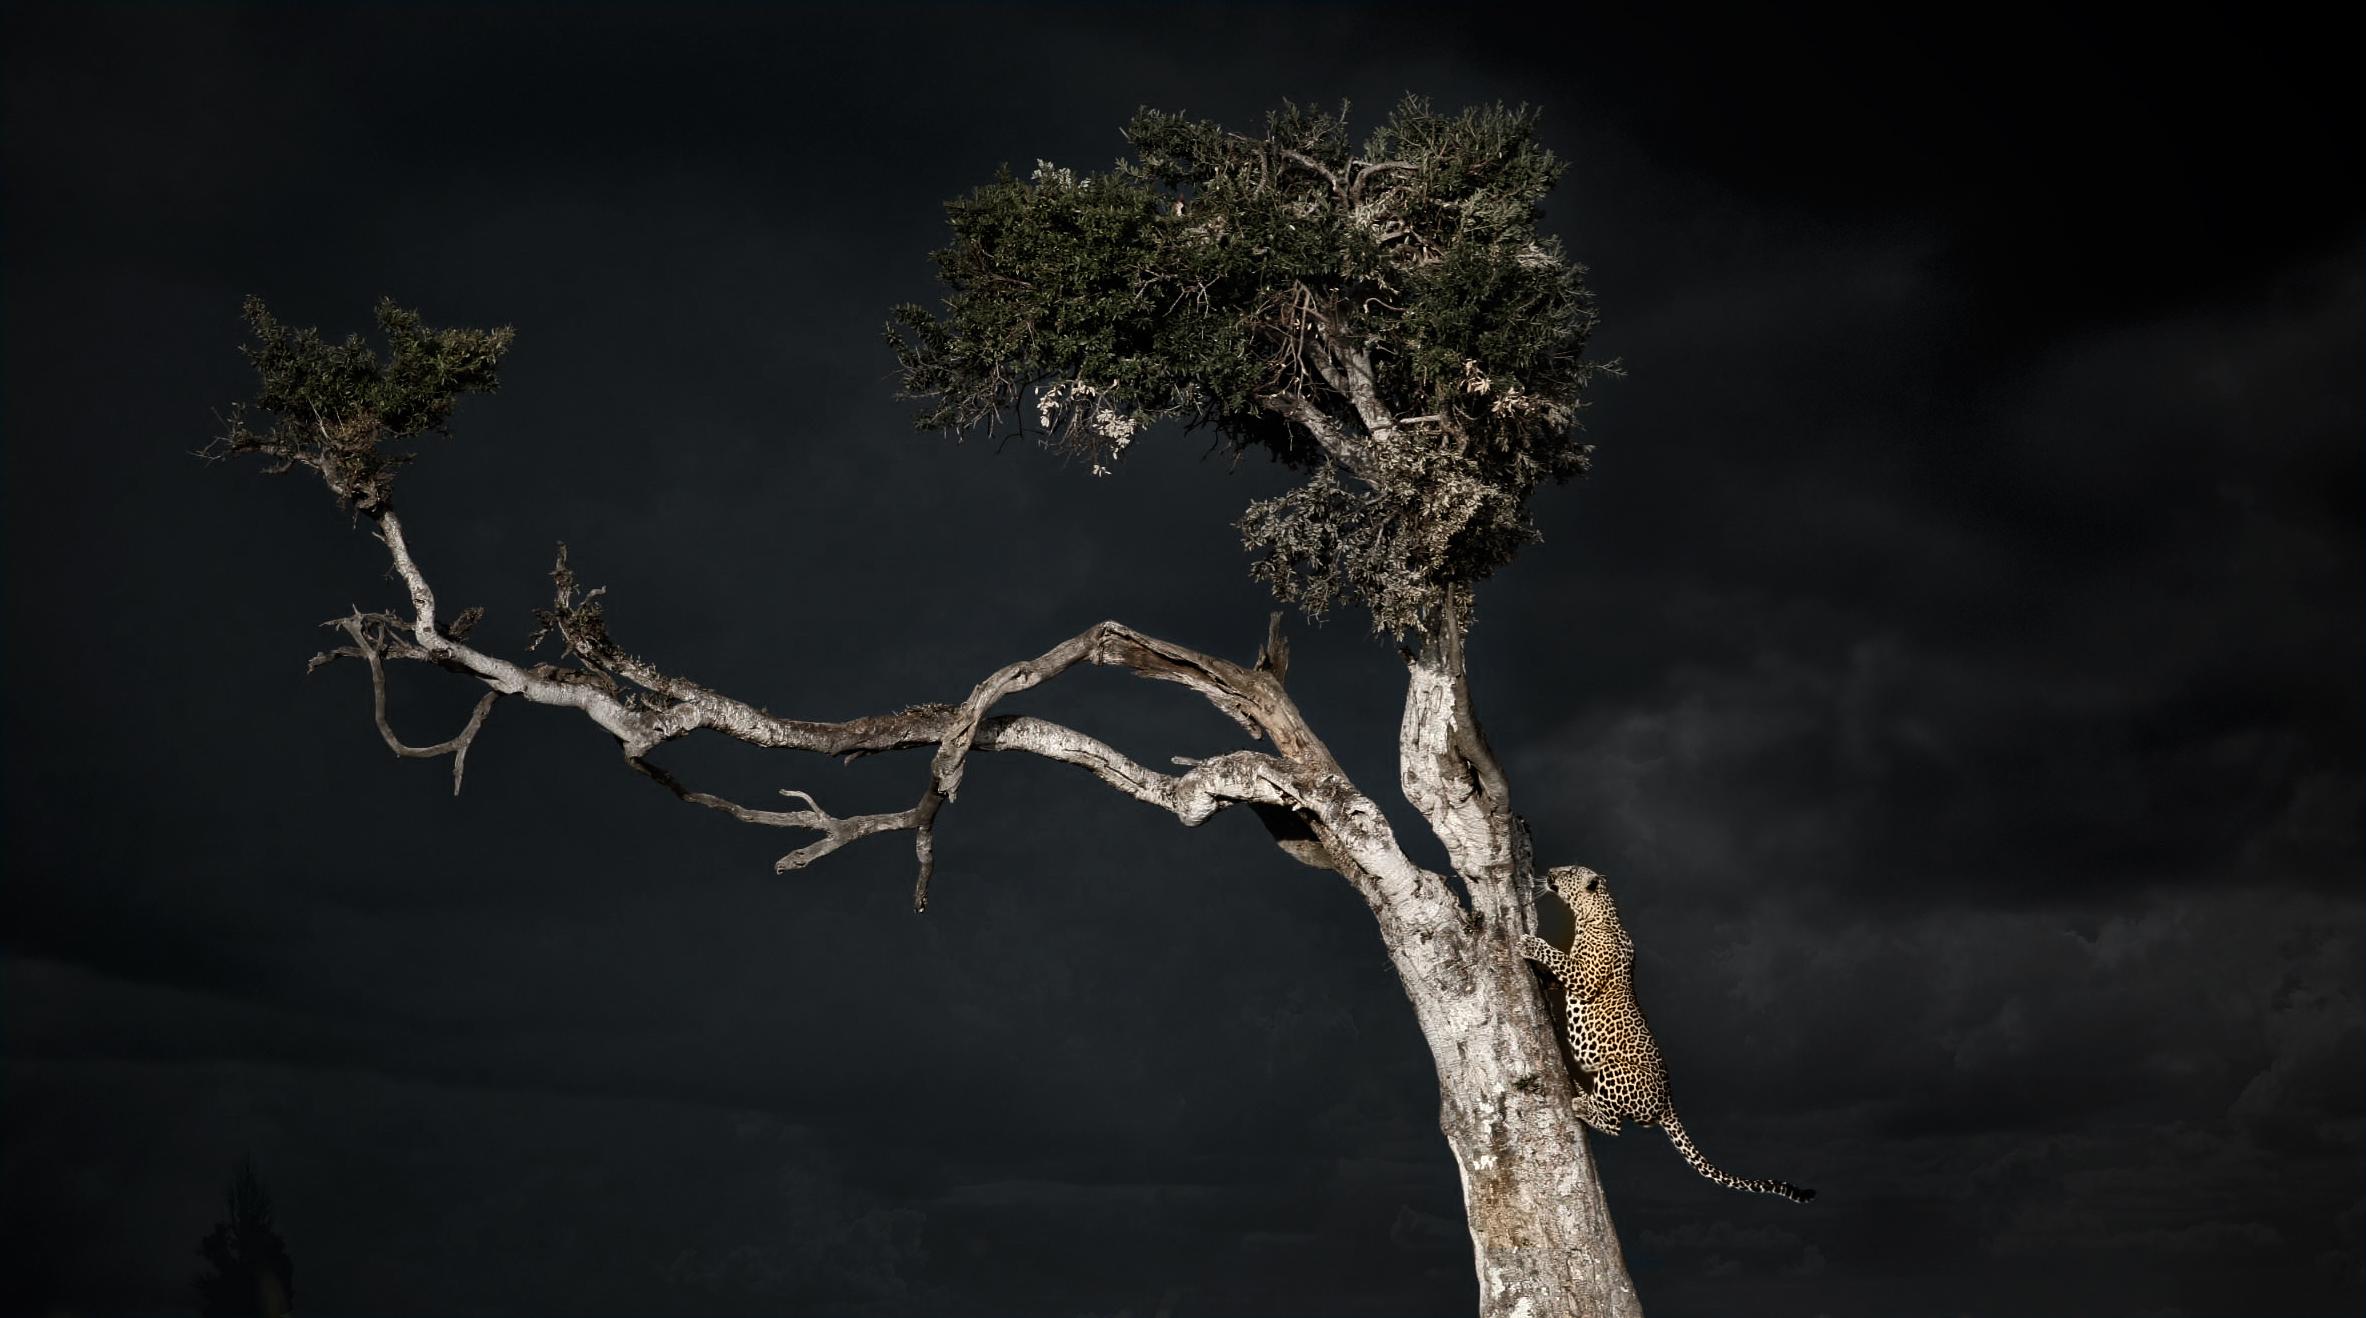 Chui-climbing-tree-in-storm-Mara.jpg